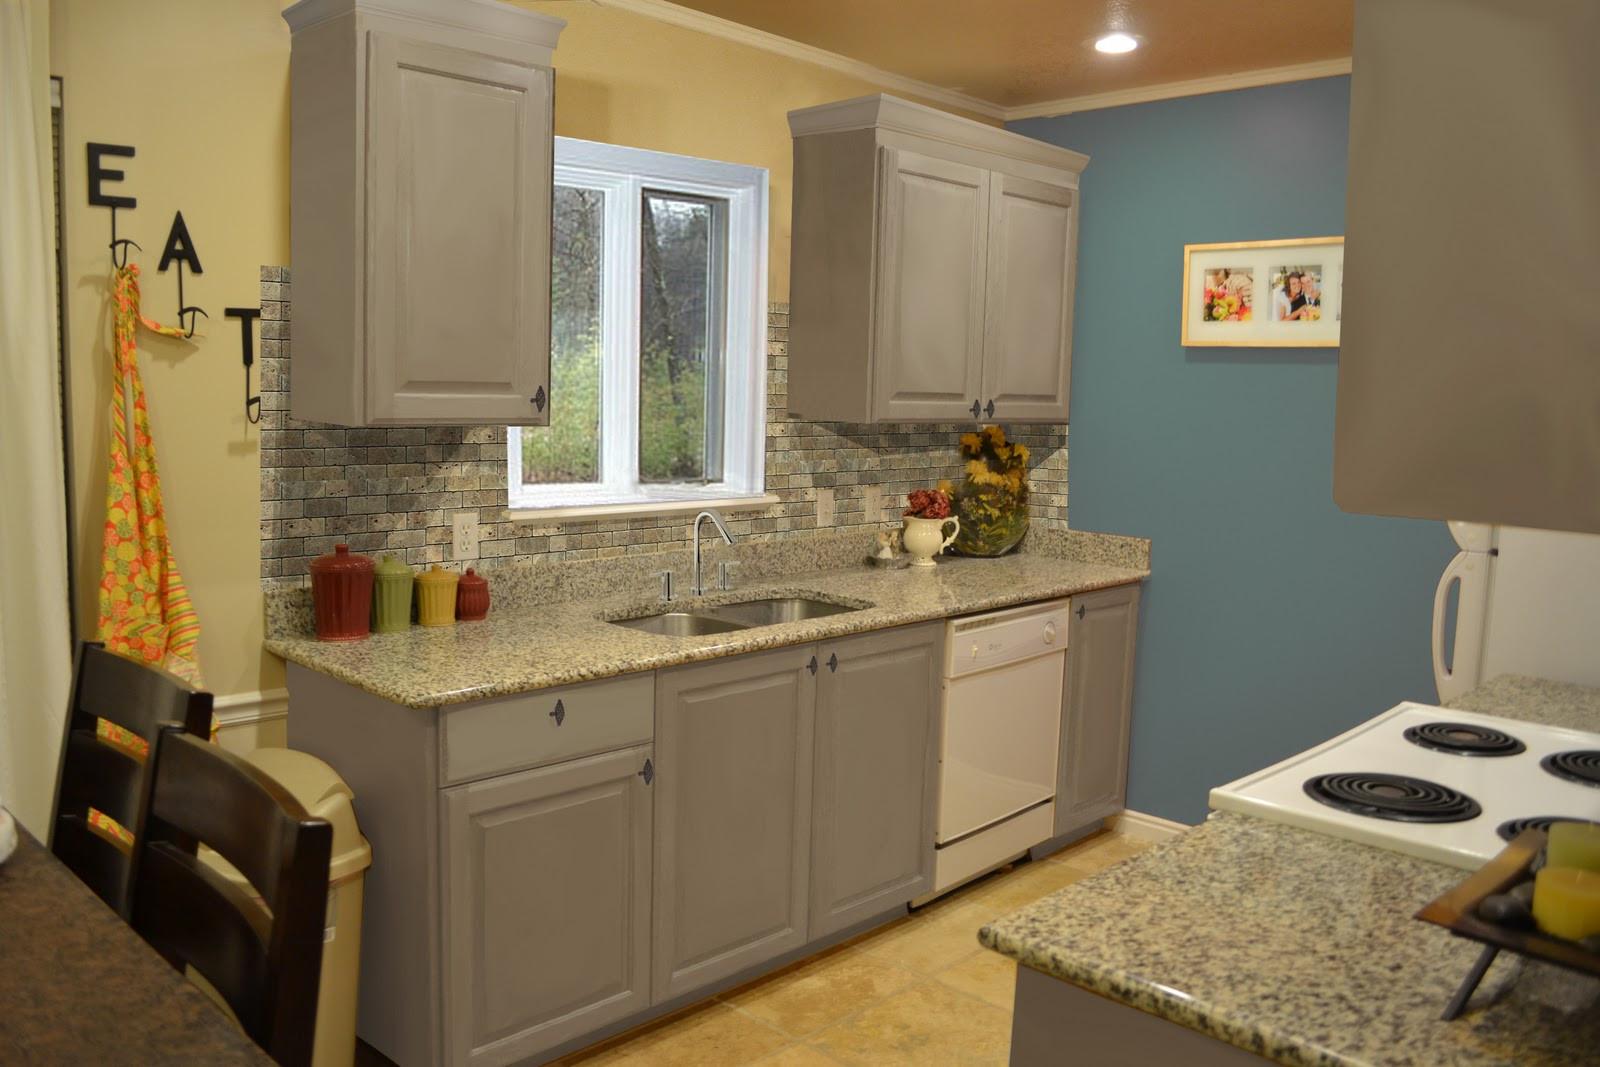 Best ideas about DIY Kitchen Cabinets Paint . Save or Pin Diy Painting Kitchen Cabinets ALL ABOUT HOUSE DESIGN Now.